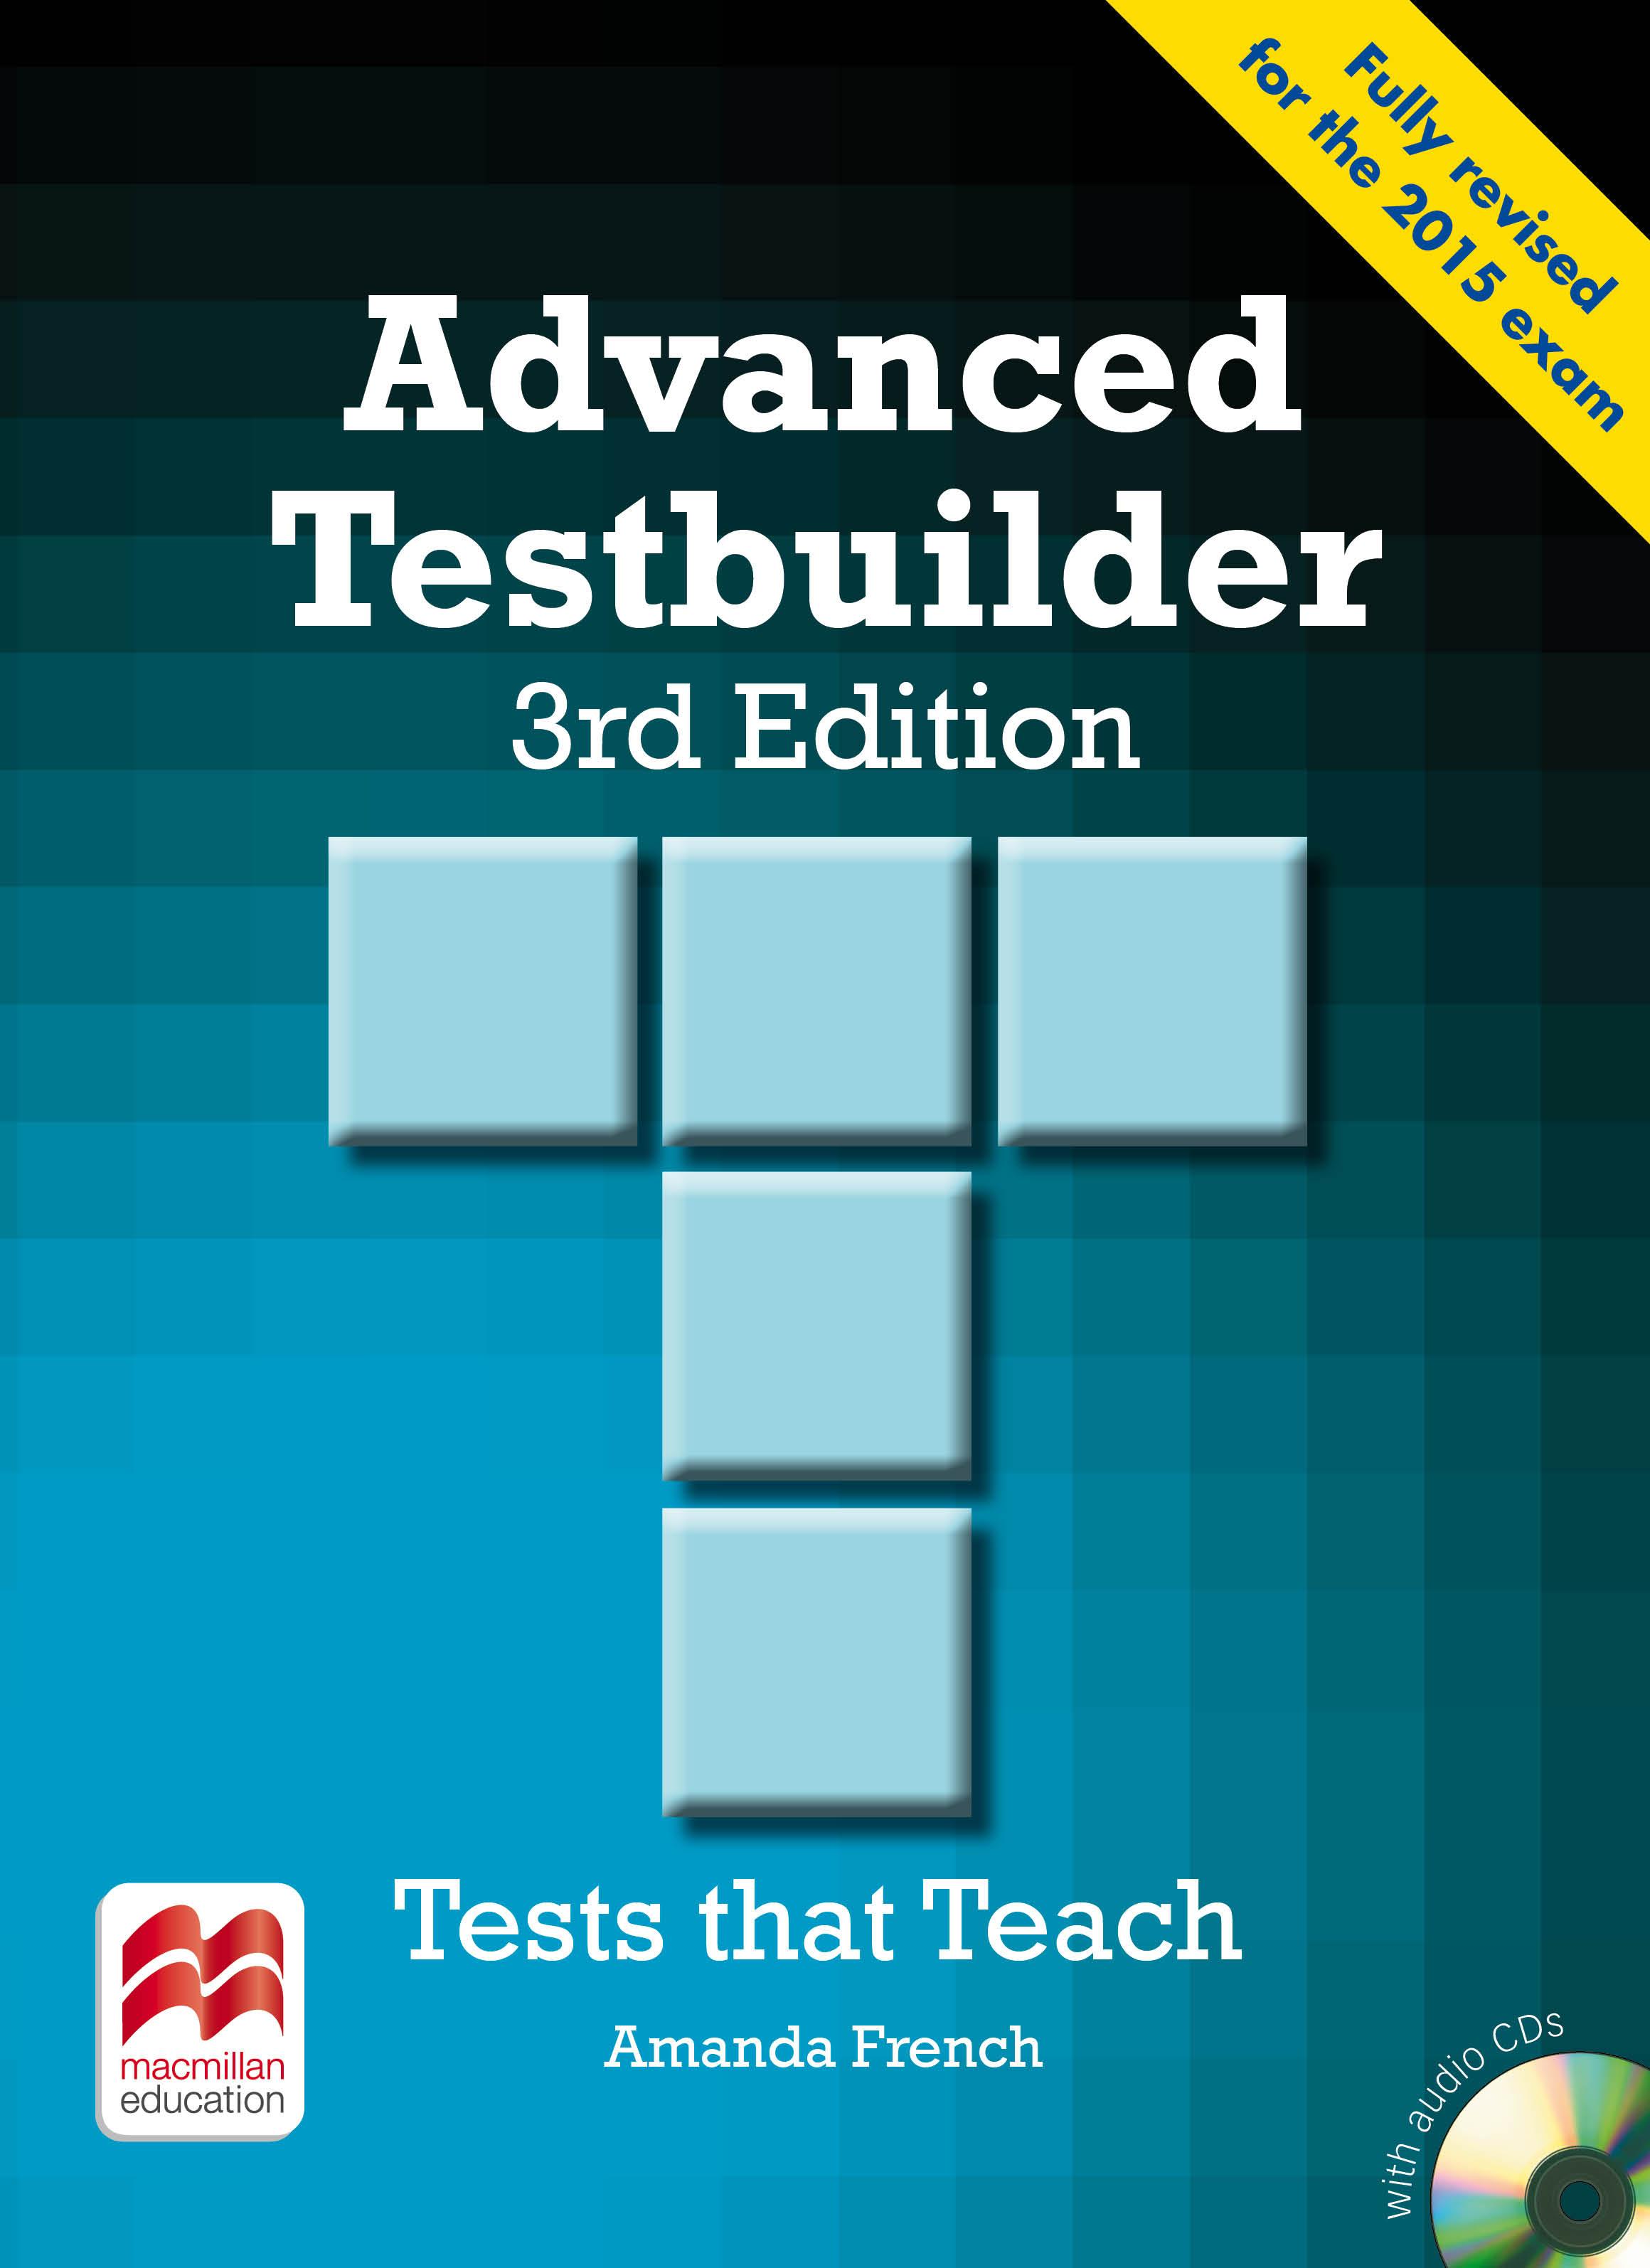 Advanced Testbuilder 3rd Edition Student